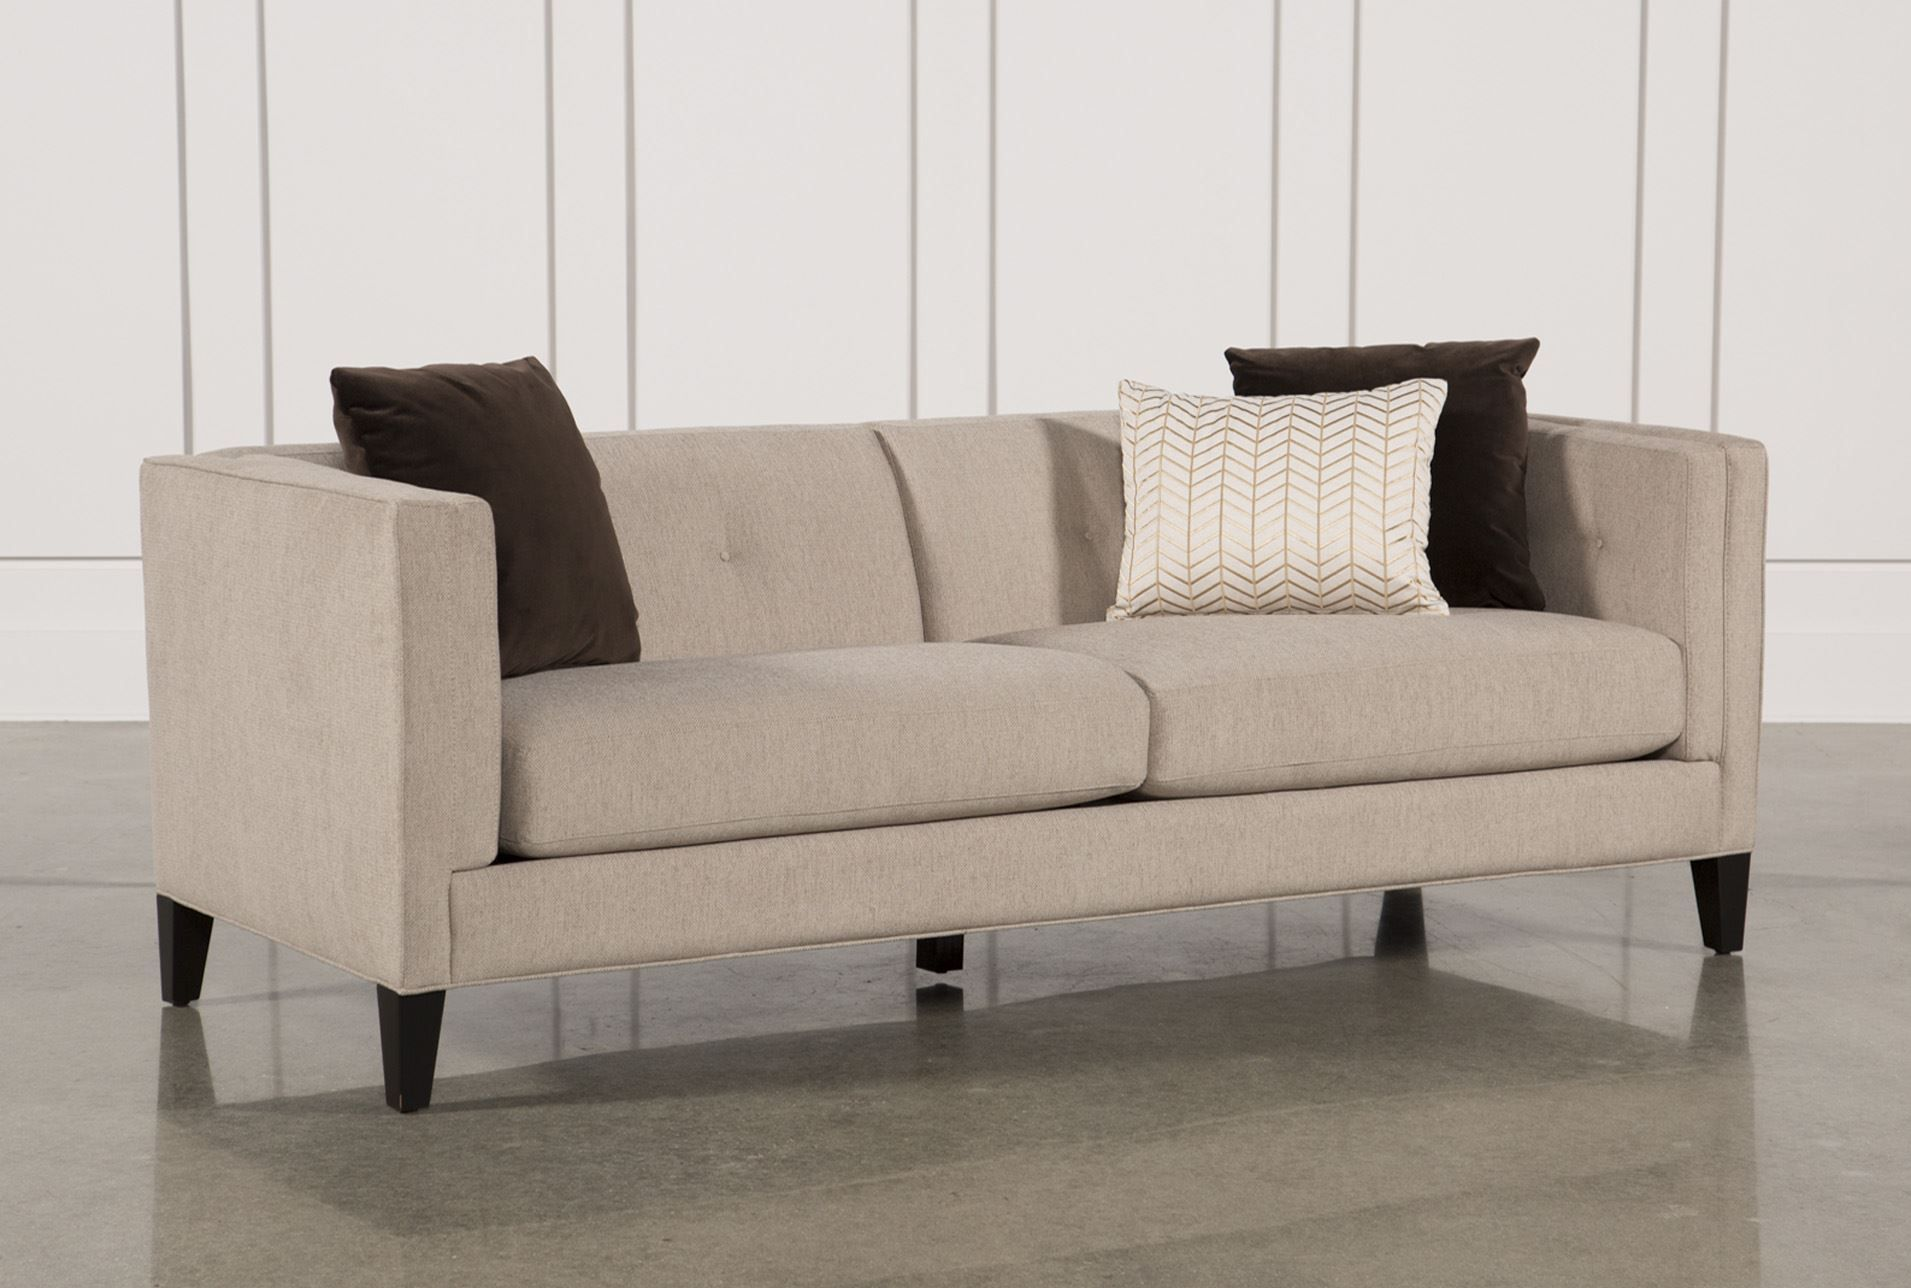 Genial Avery Sofa